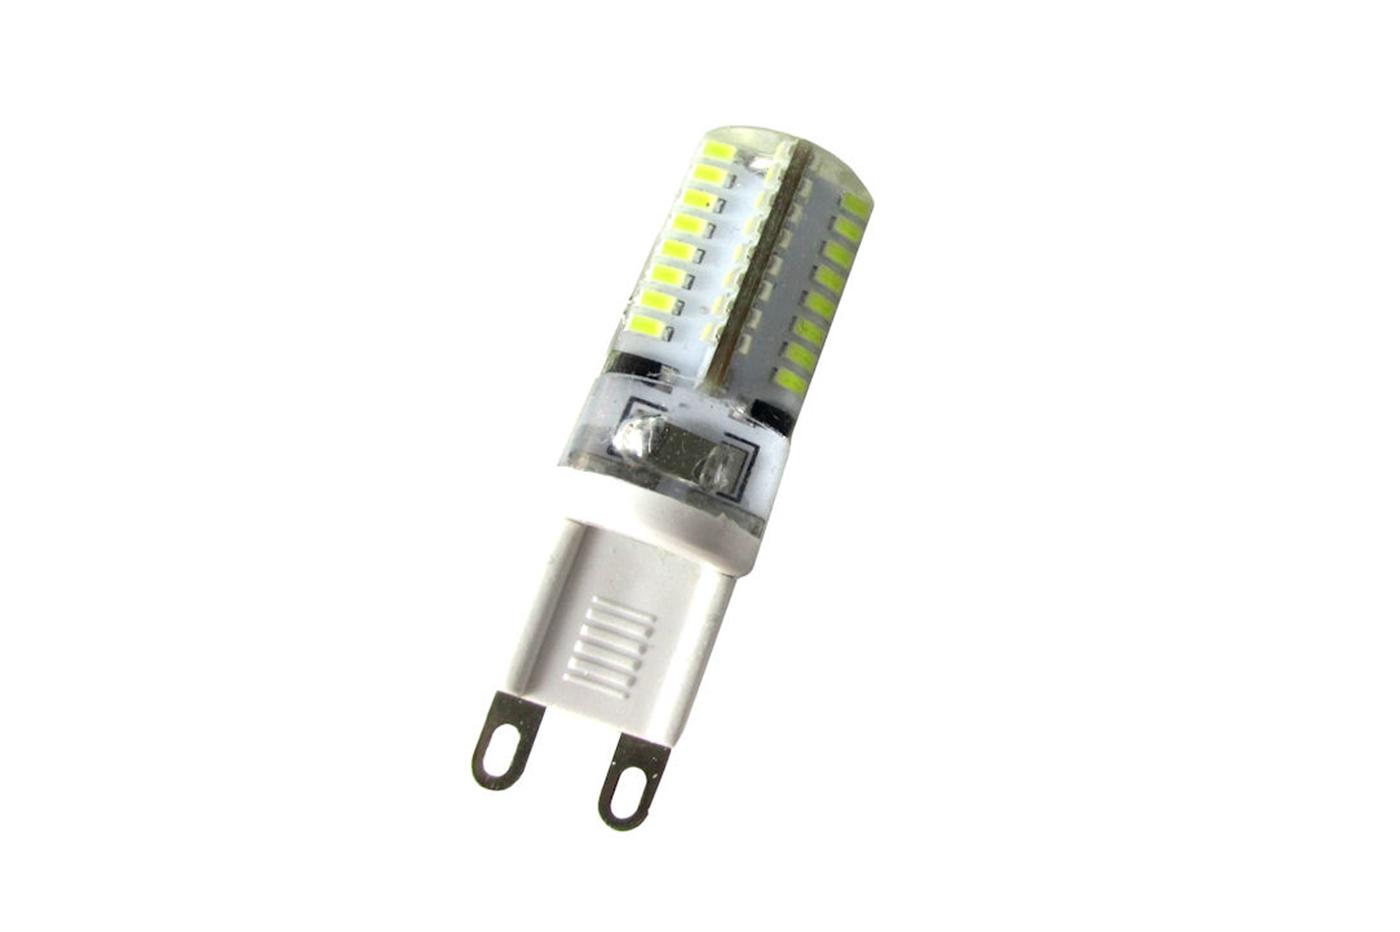 Lampadine Led Attacco G4.Bes 15636 Lampadine E Adattatori Beselettronica